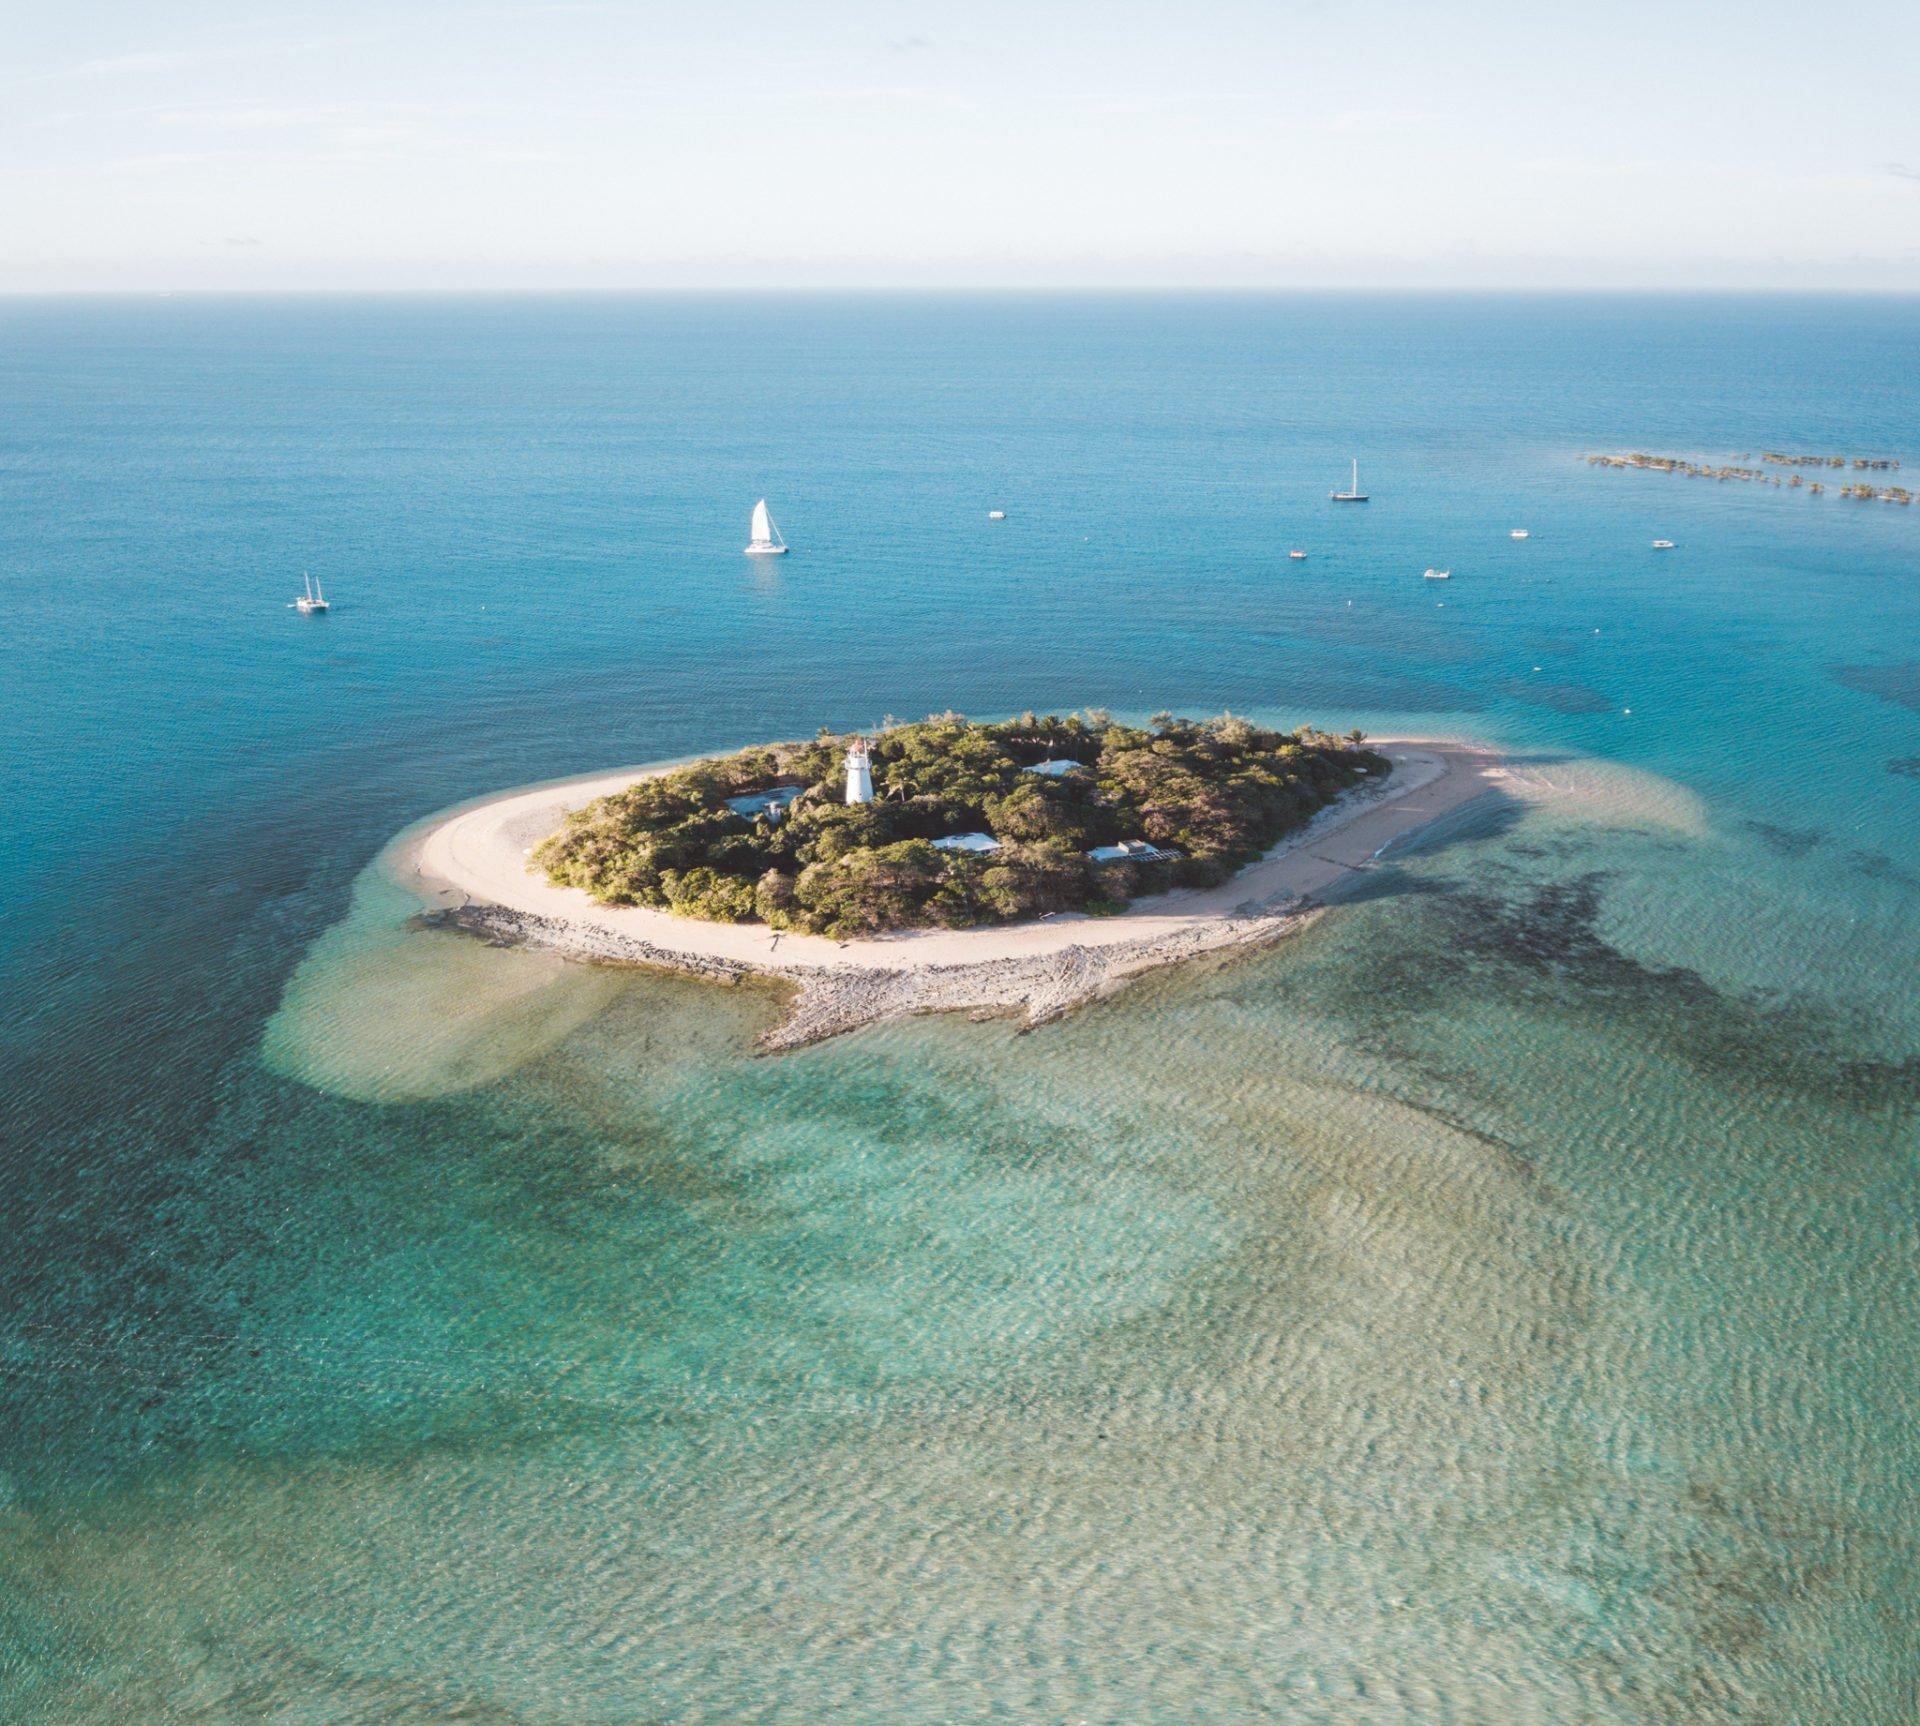 Low Island, Low Isles, Port Douglas